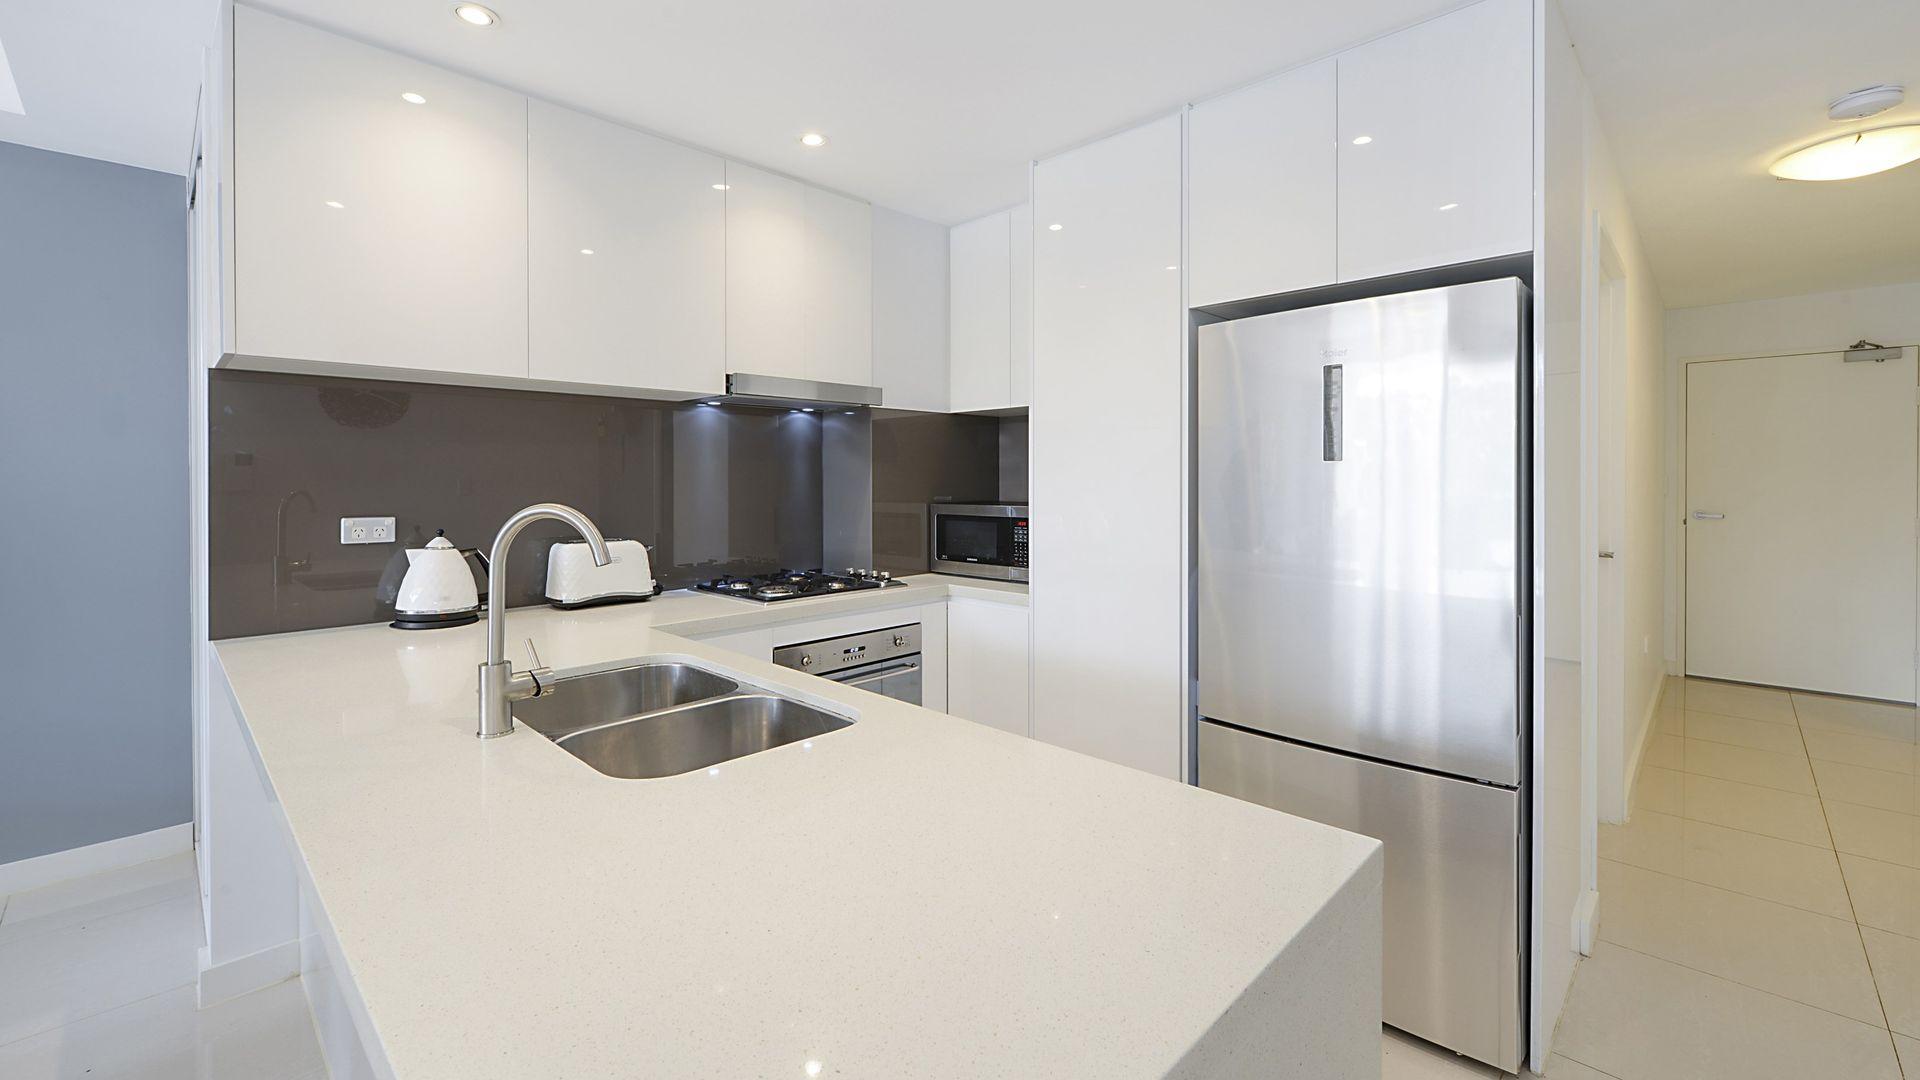 203/16 Warburton Street, Gymea NSW 2227, Image 2